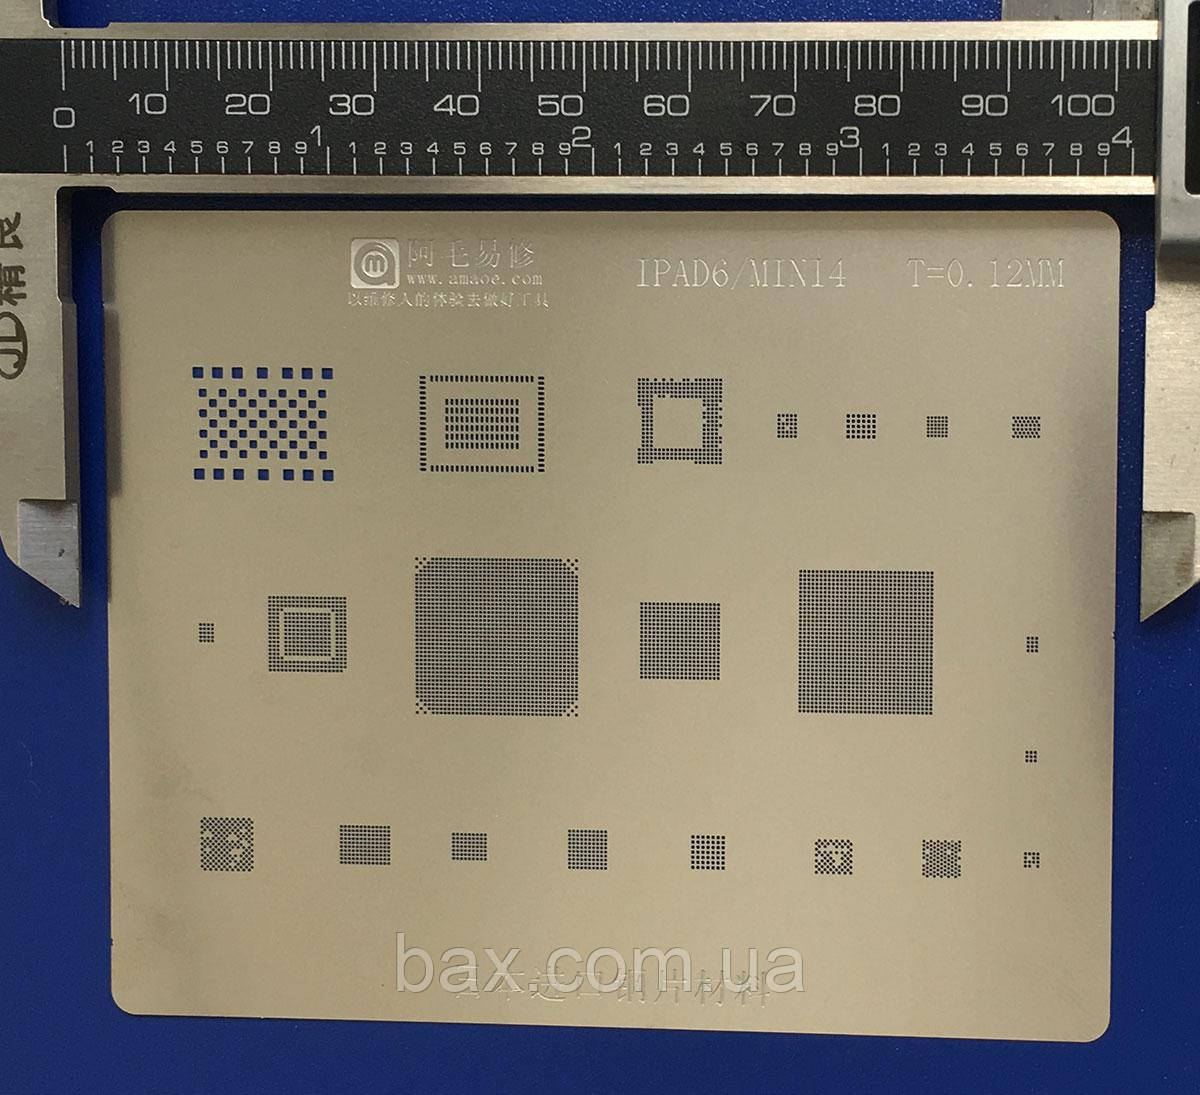 Amaoe BGA трафарет iPad Air 2/iPad mini 4 0.12mm